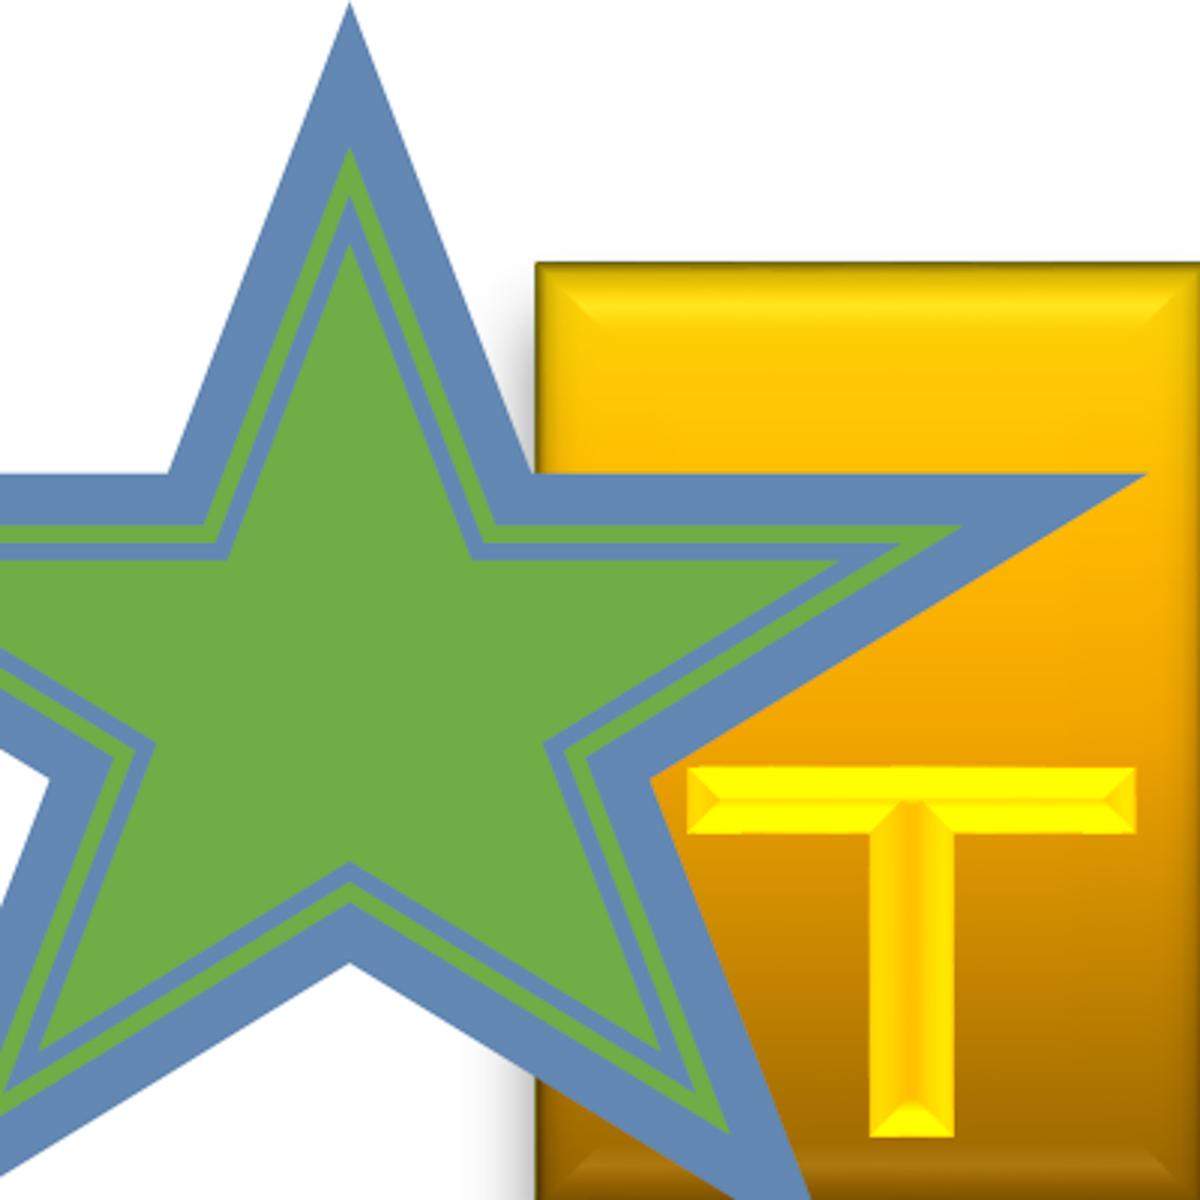 Shopify Review Importer app by Taknalogy